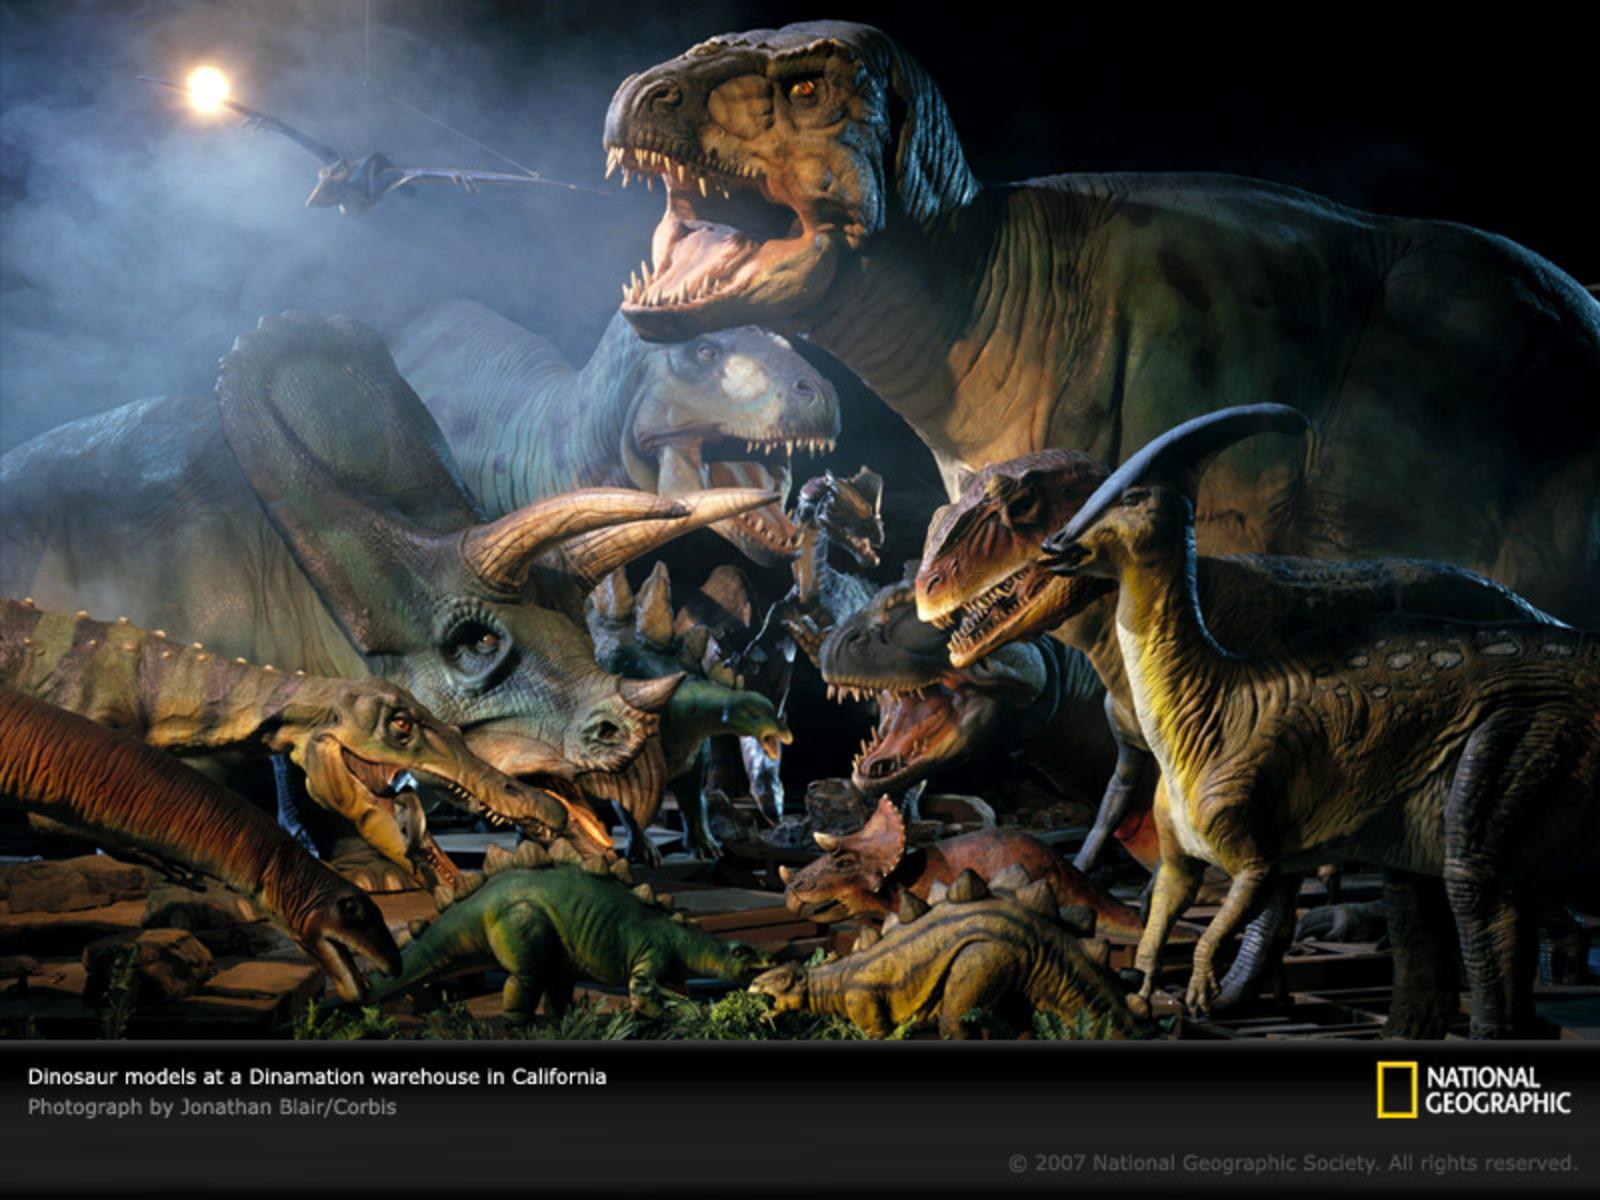 Wallpapers dinosaur wallpapersdinosaur wallpaperdinosaurs wallpaper 1600x1200